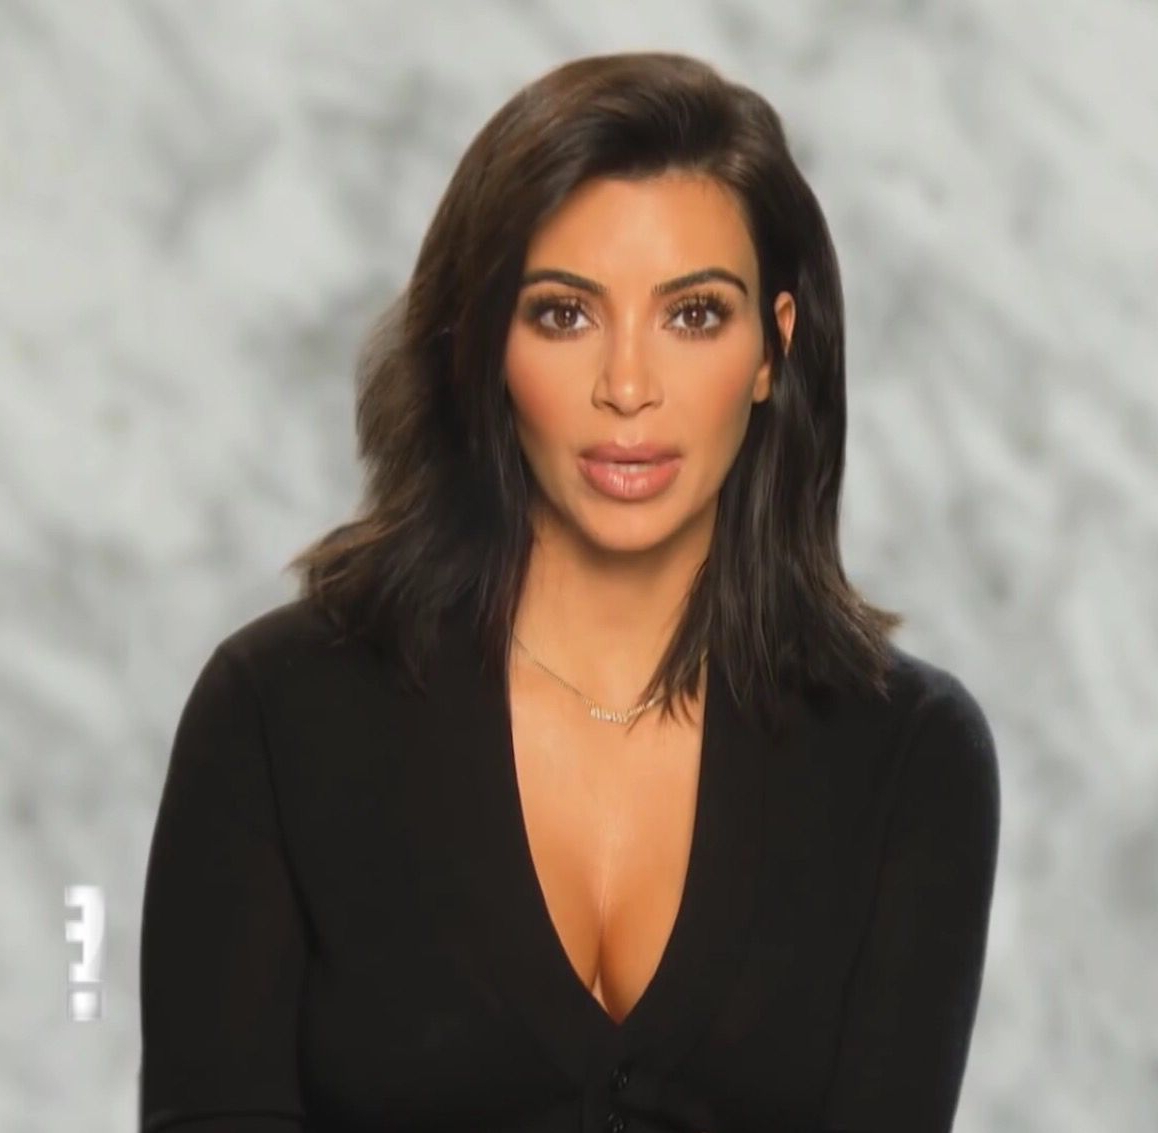 Kim Kardashian Short Hair Makeup   Hair! : ) In 2018   Pinterest Within Kim Kardashian Short Haircuts (View 15 of 25)